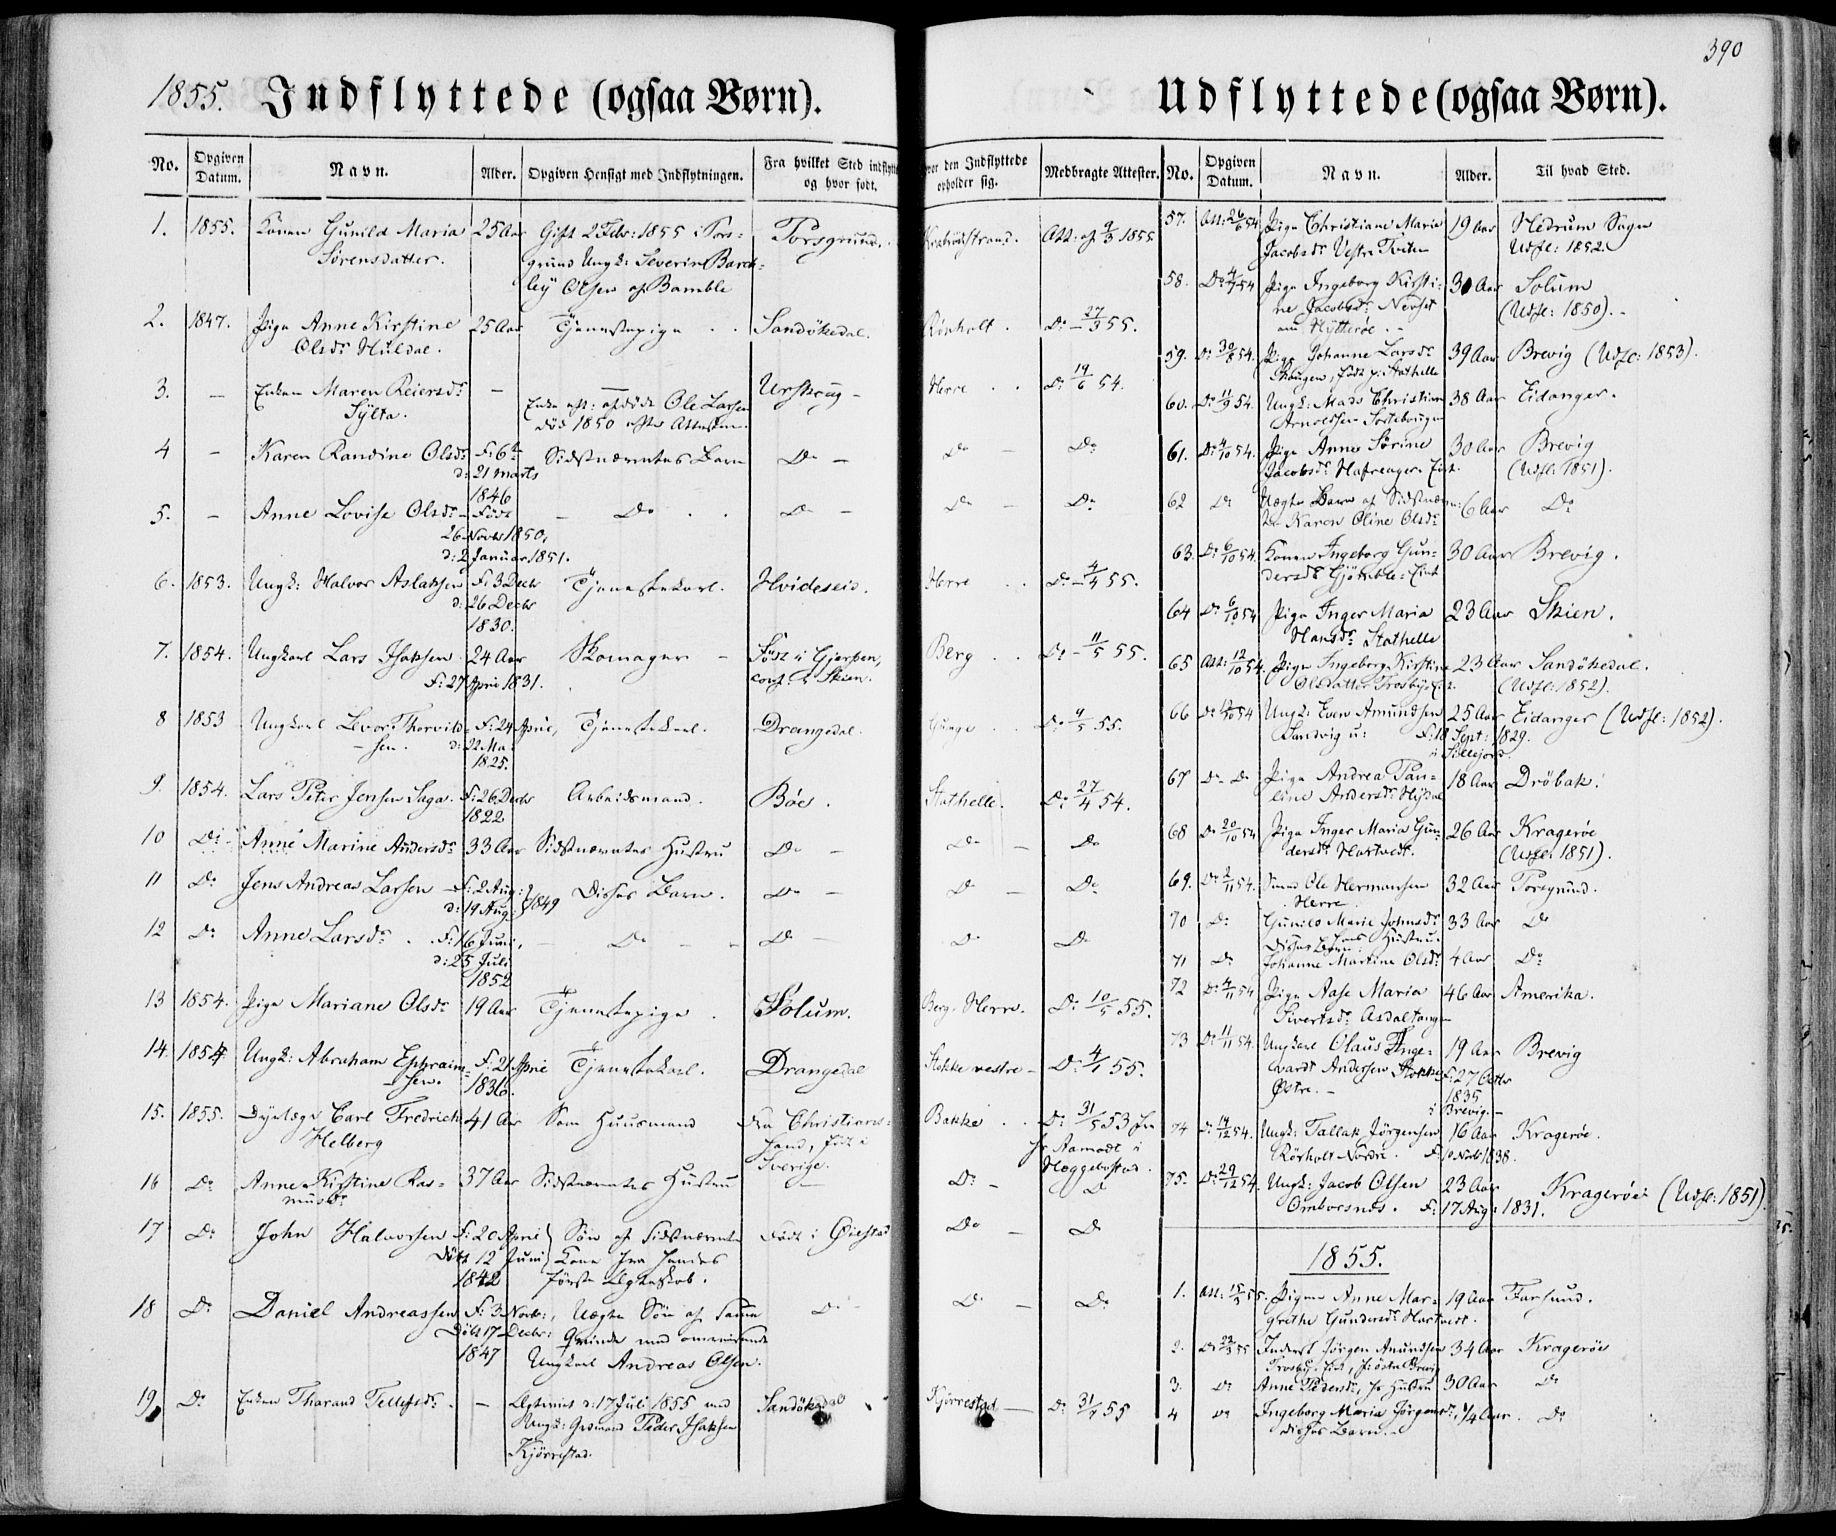 SAKO, Bamble kirkebøker, F/Fa/L0005: Ministerialbok nr. I 5, 1854-1869, s. 390